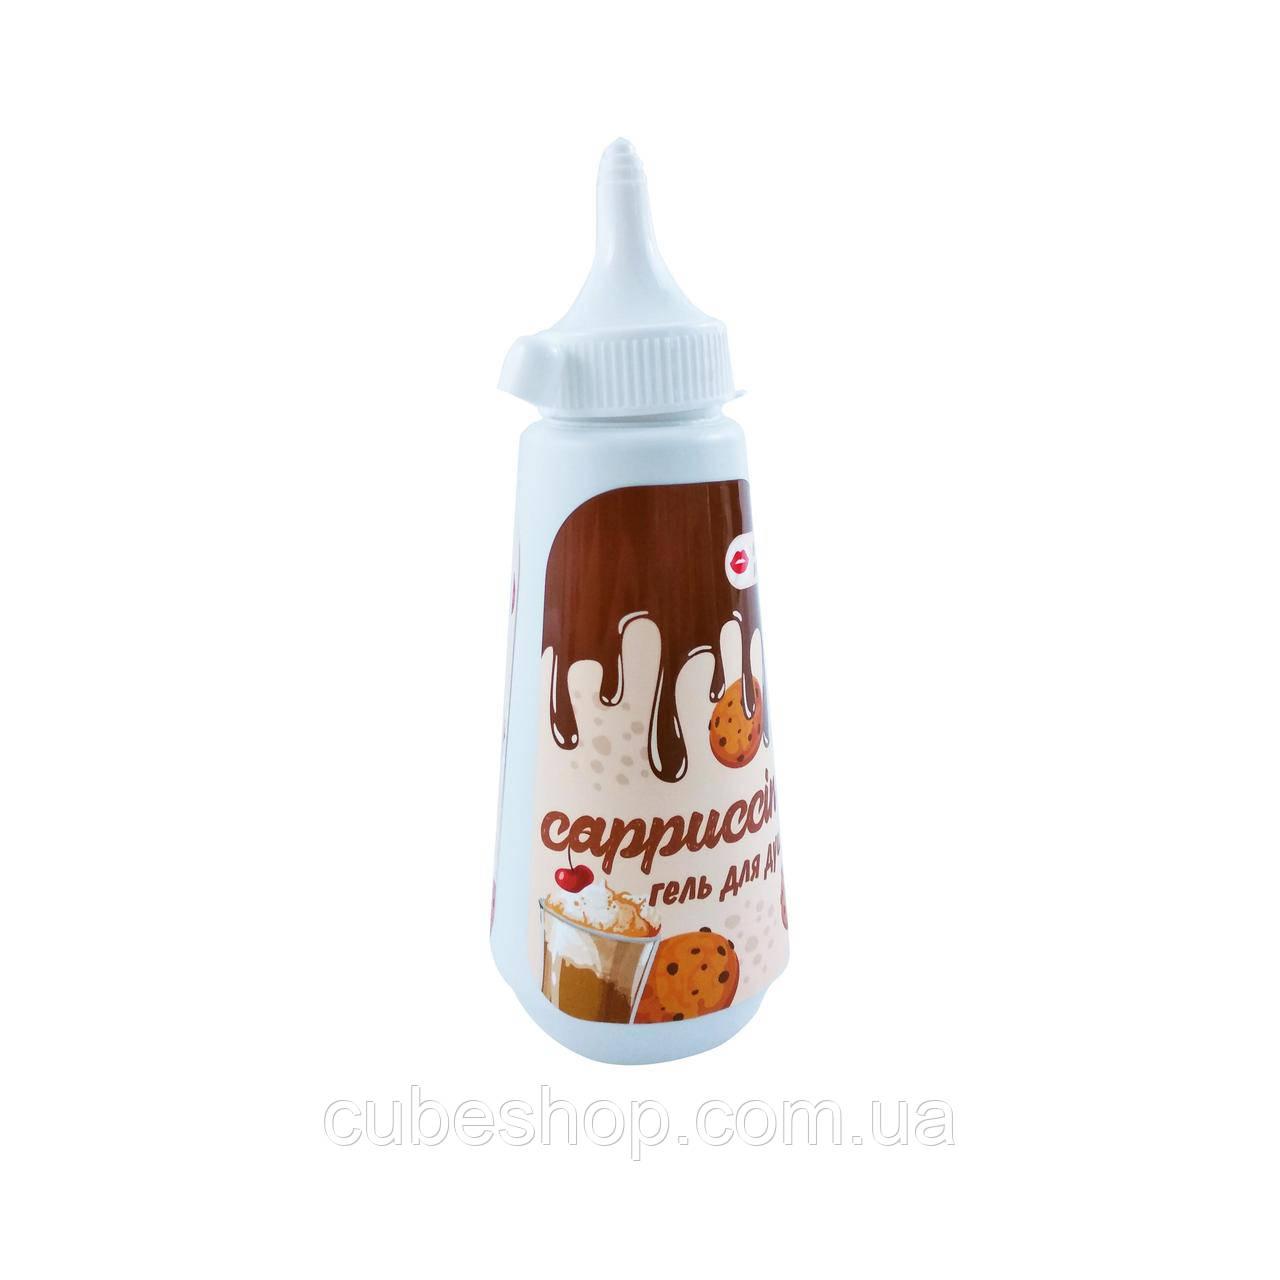 "Гель для душа ""Cappuccino "" белый, 200 мл"